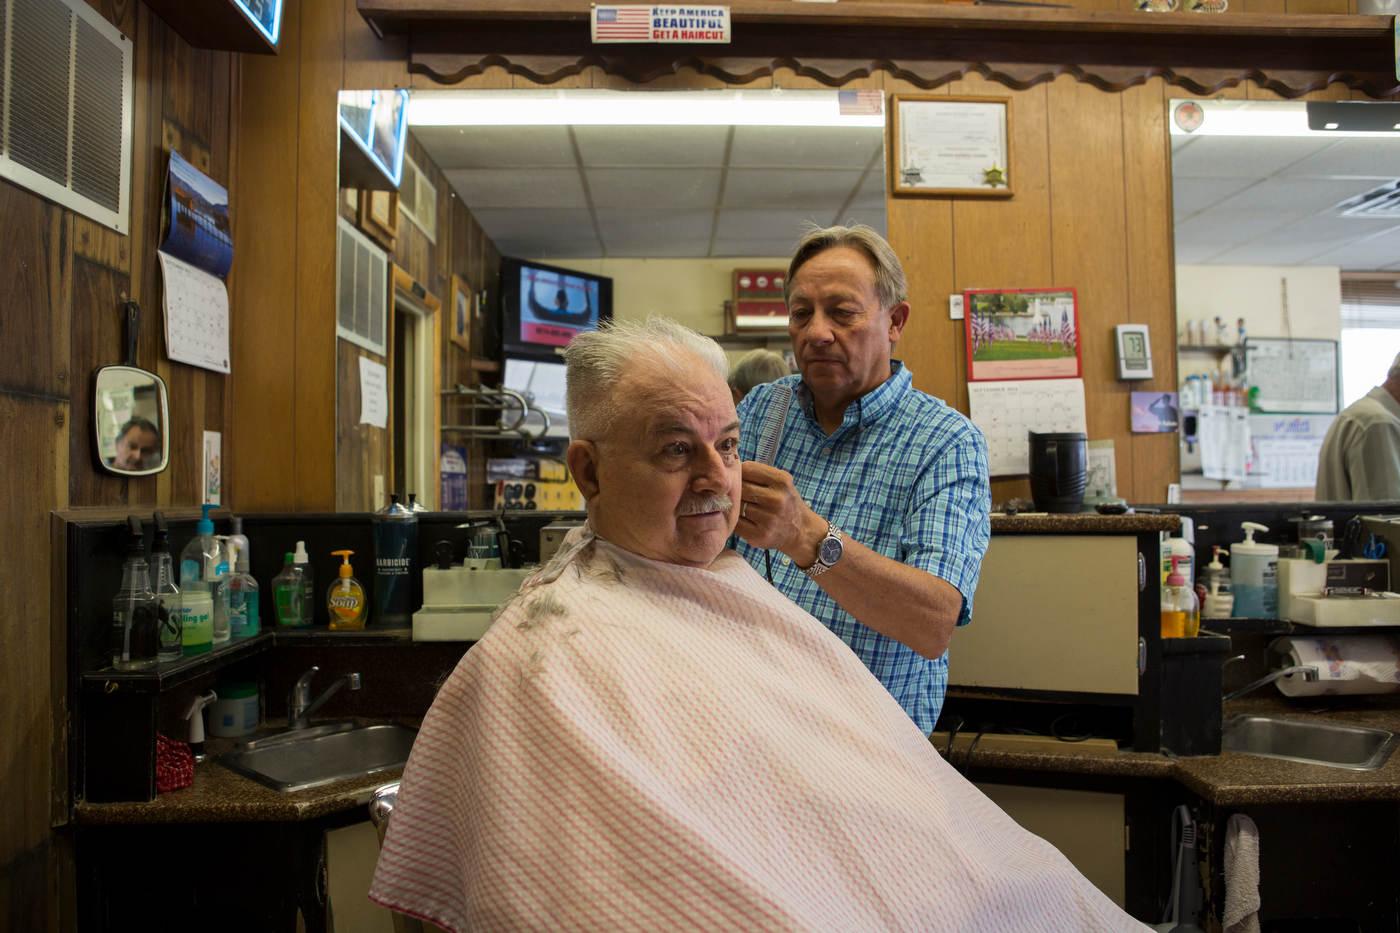 Marvin Ackers, 79, likes Trump's business acumen, Glen's Barber Shop | Dodge City, Kansas.